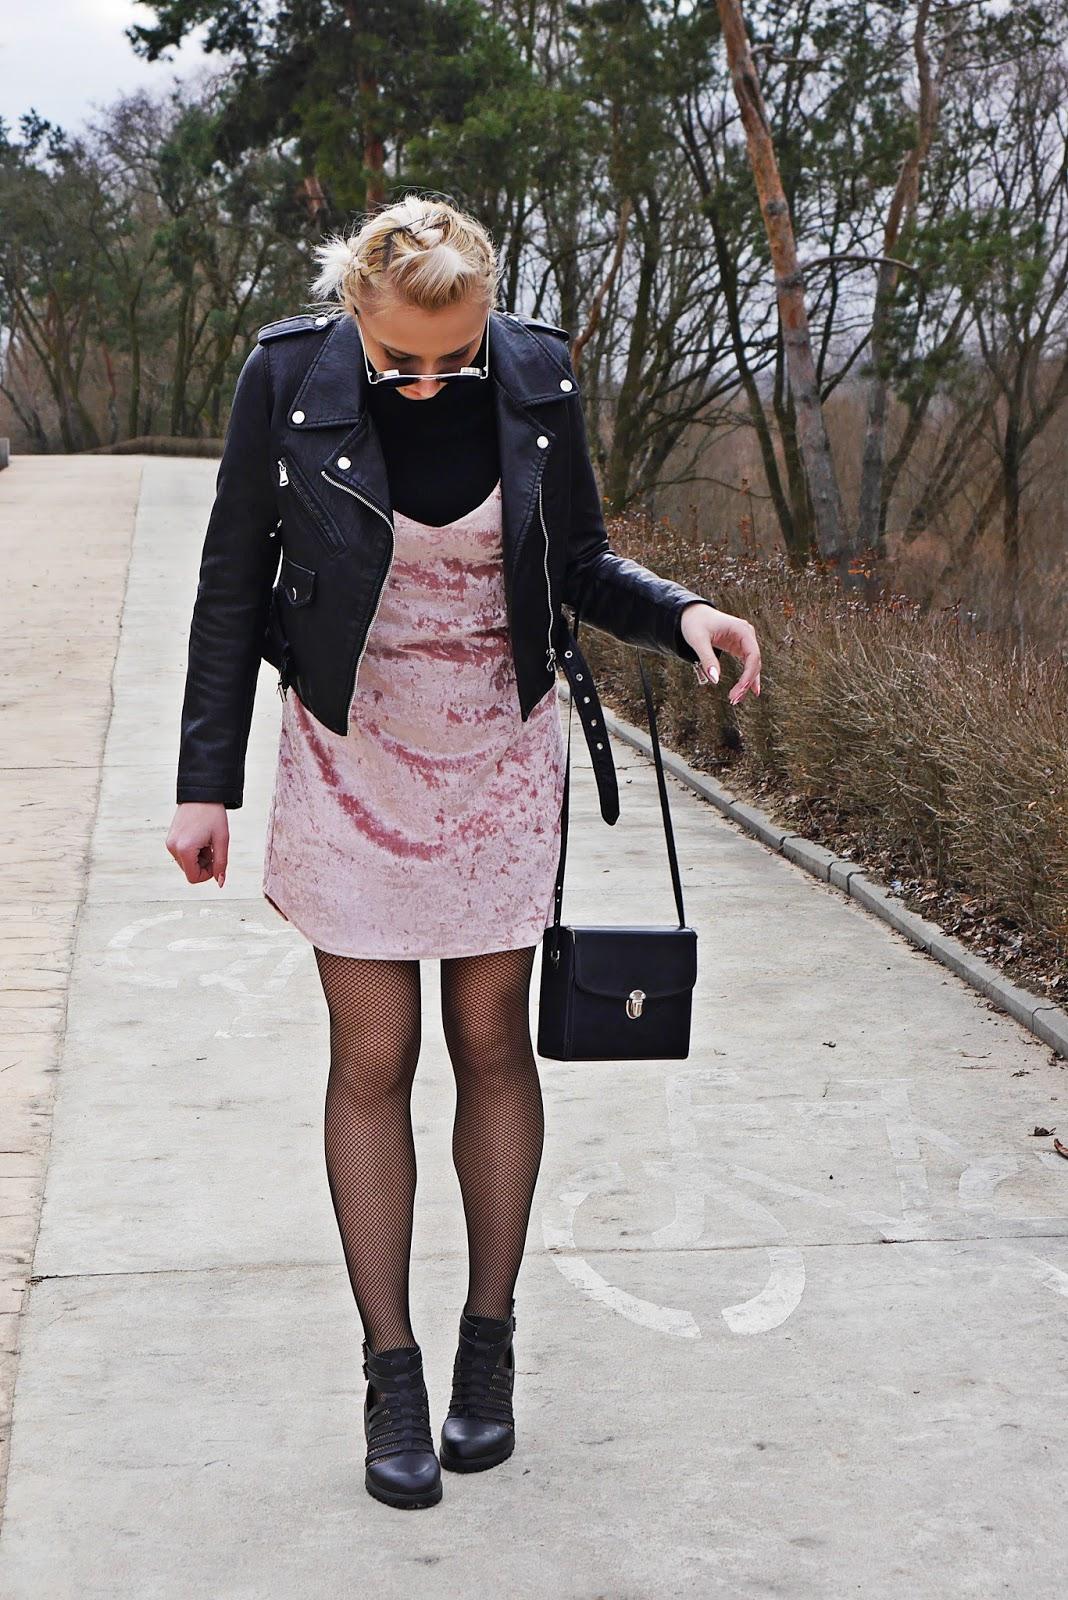 czarna_ramoneska_zaful_kabaretki_rozowa_welurowa_sukienka_karyn_130317b